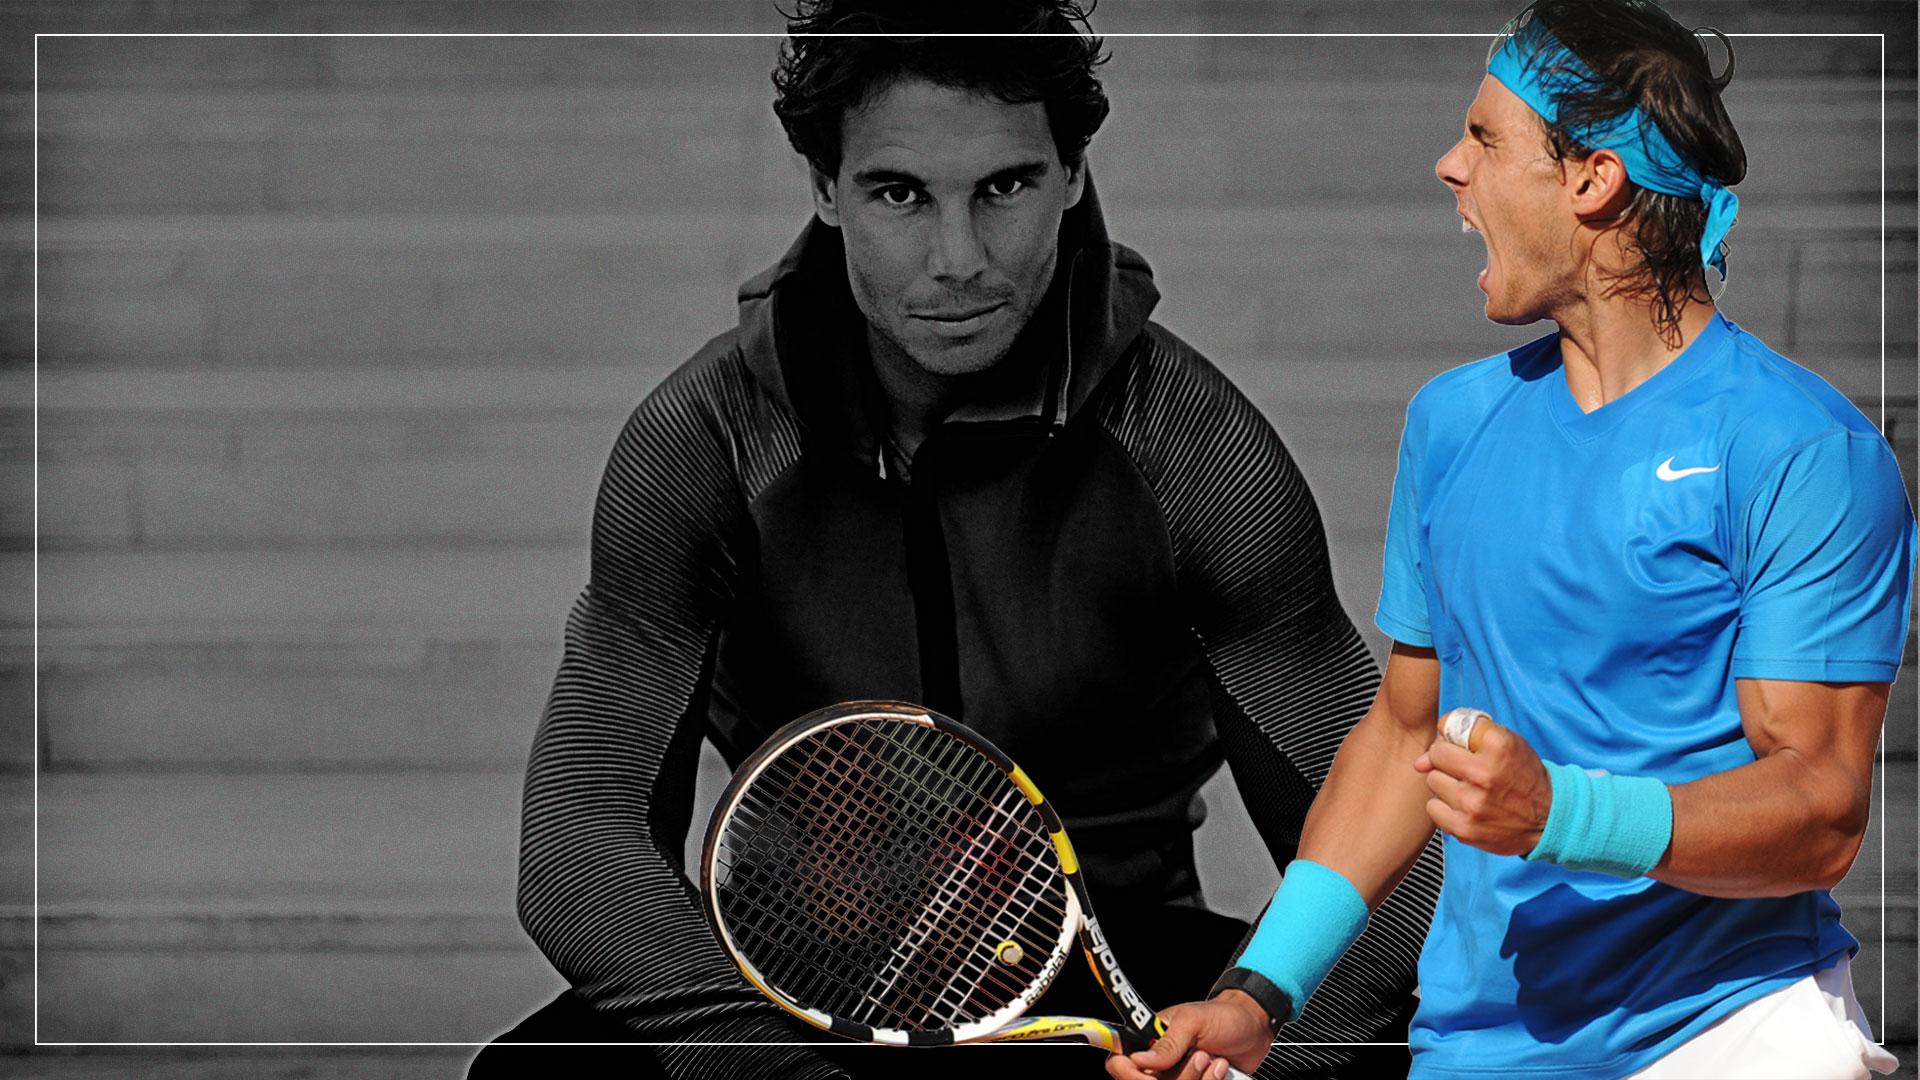 344ca55b9a Rafael Nadal vai dominando a temporada de saibro. leia no blog da FPT